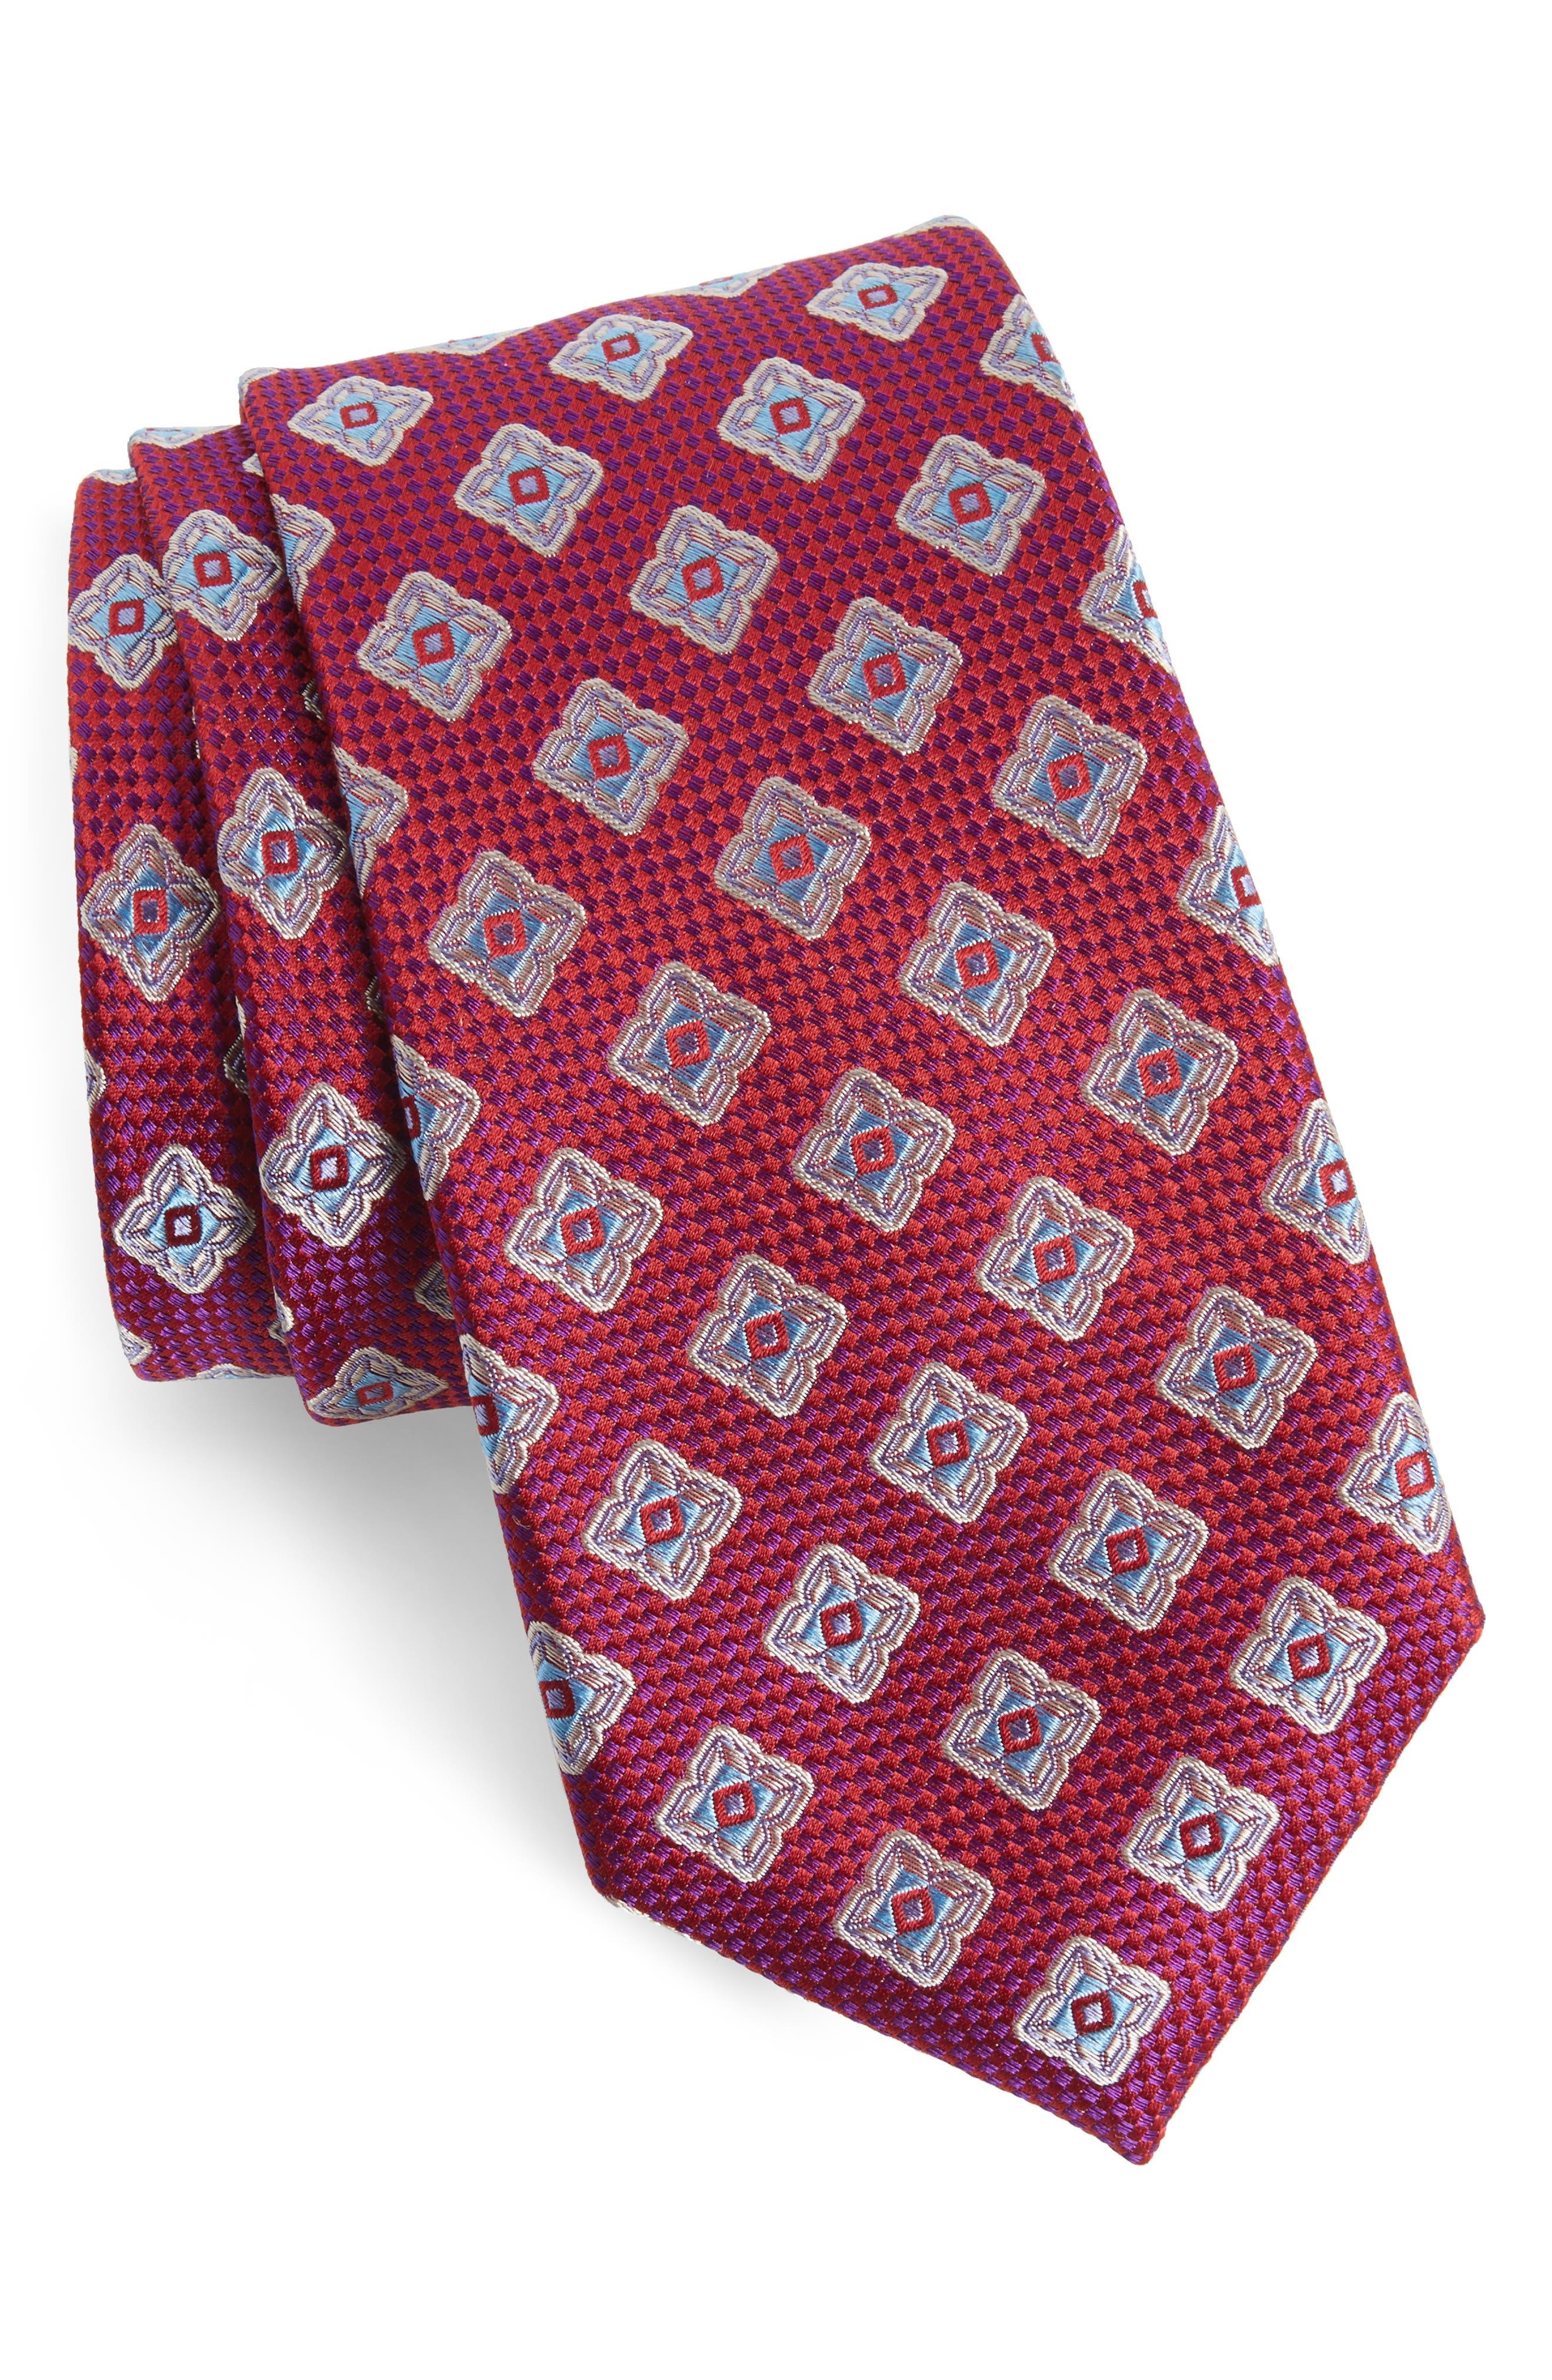 Main Image - Nordstrom Men's Shop Ethan Medallion Silk Tie